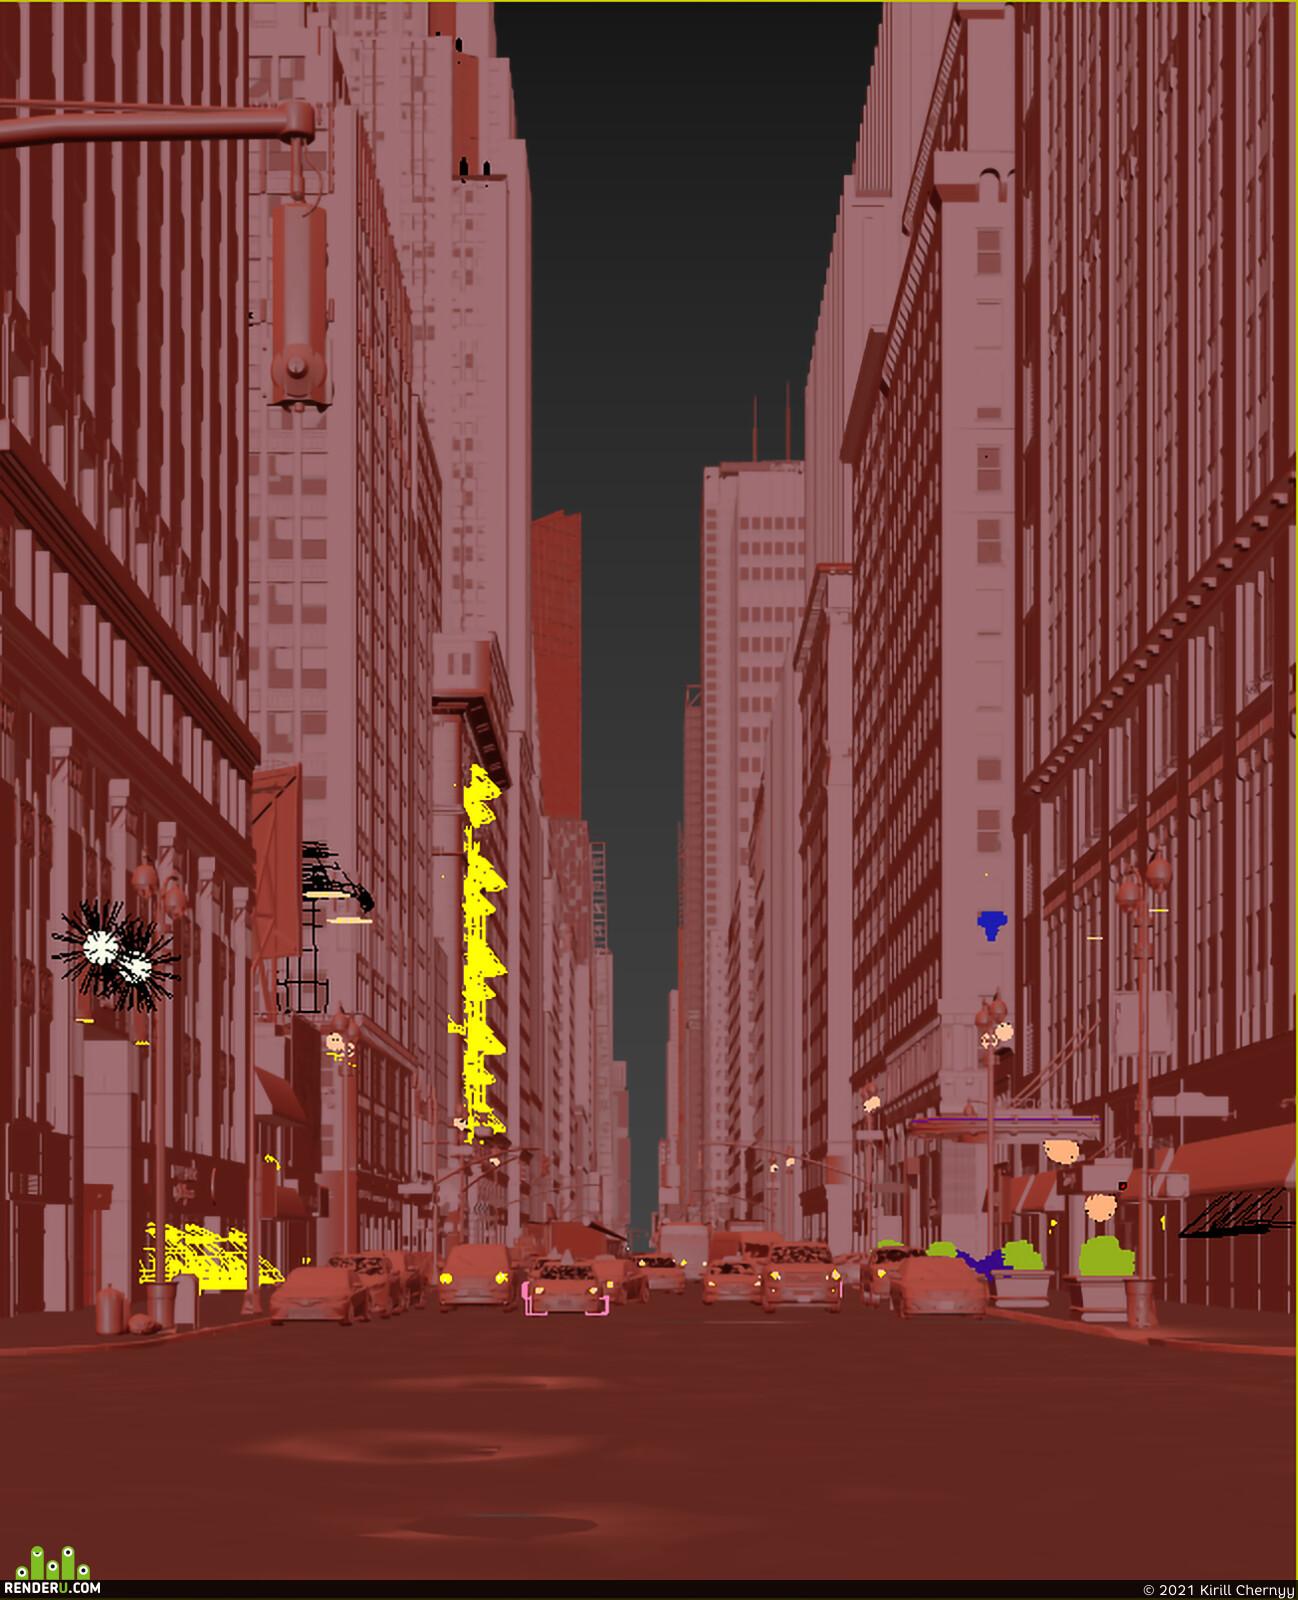 nyc, Buildings, manhattan, city, visualization, coronarender, inster.studio, kirill chernyy